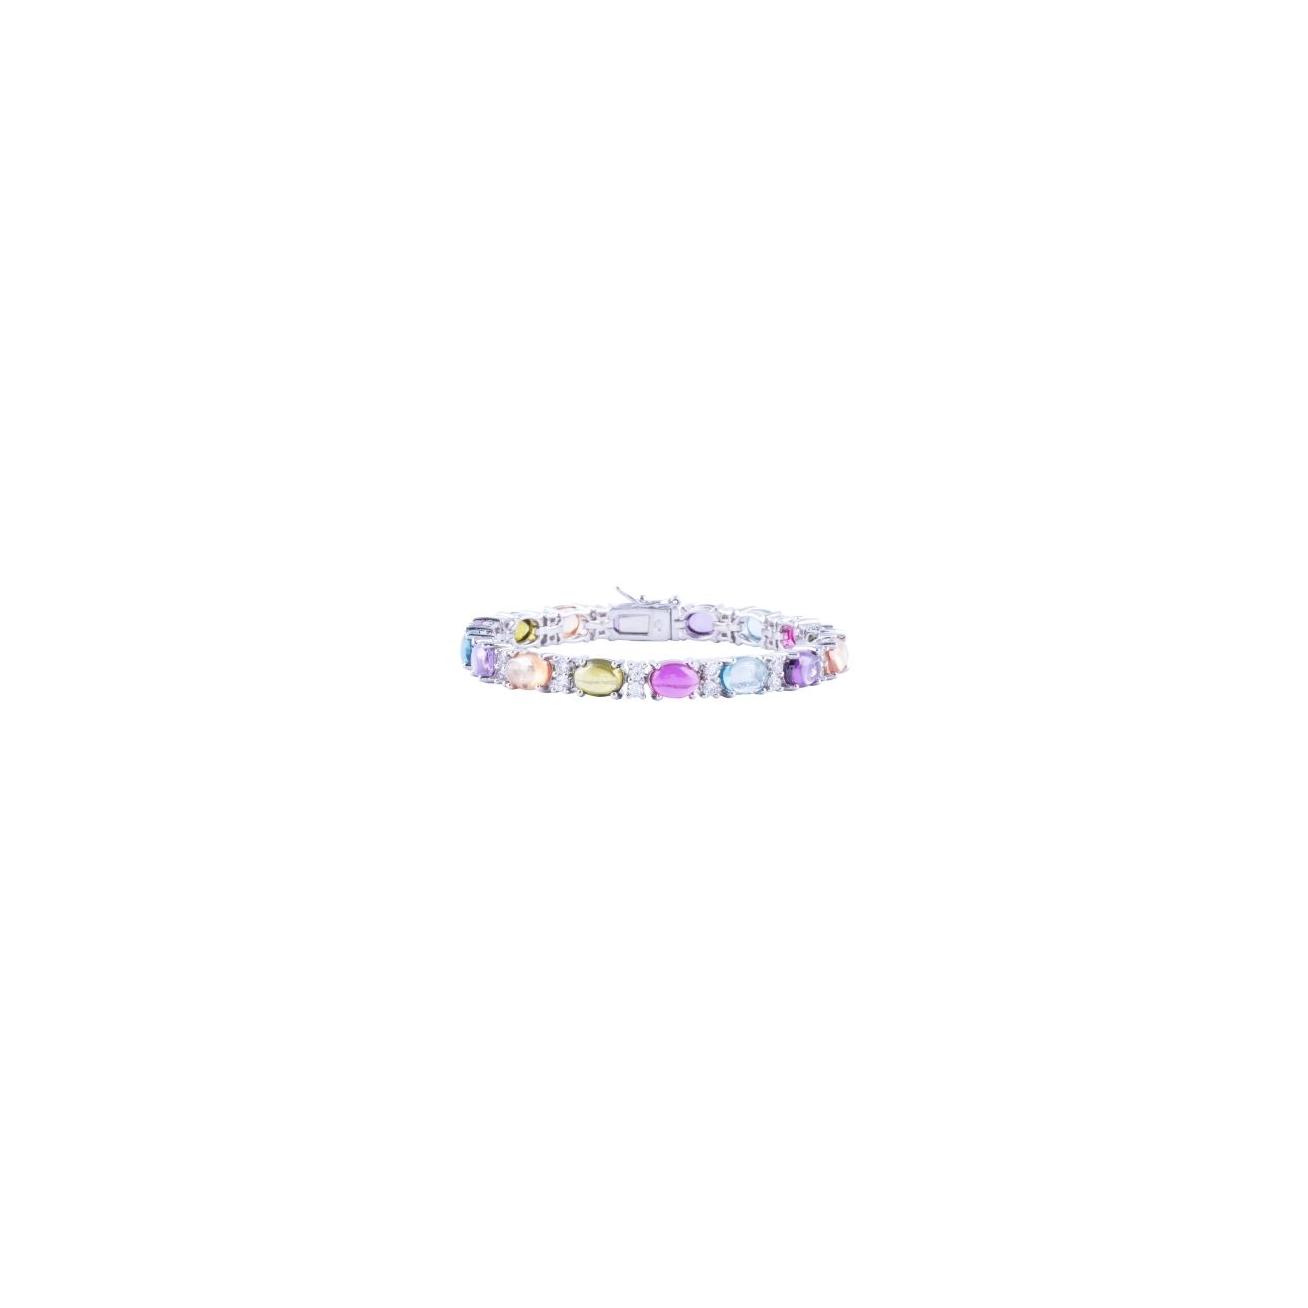 Multicolor oval cabochon tennis bracelet